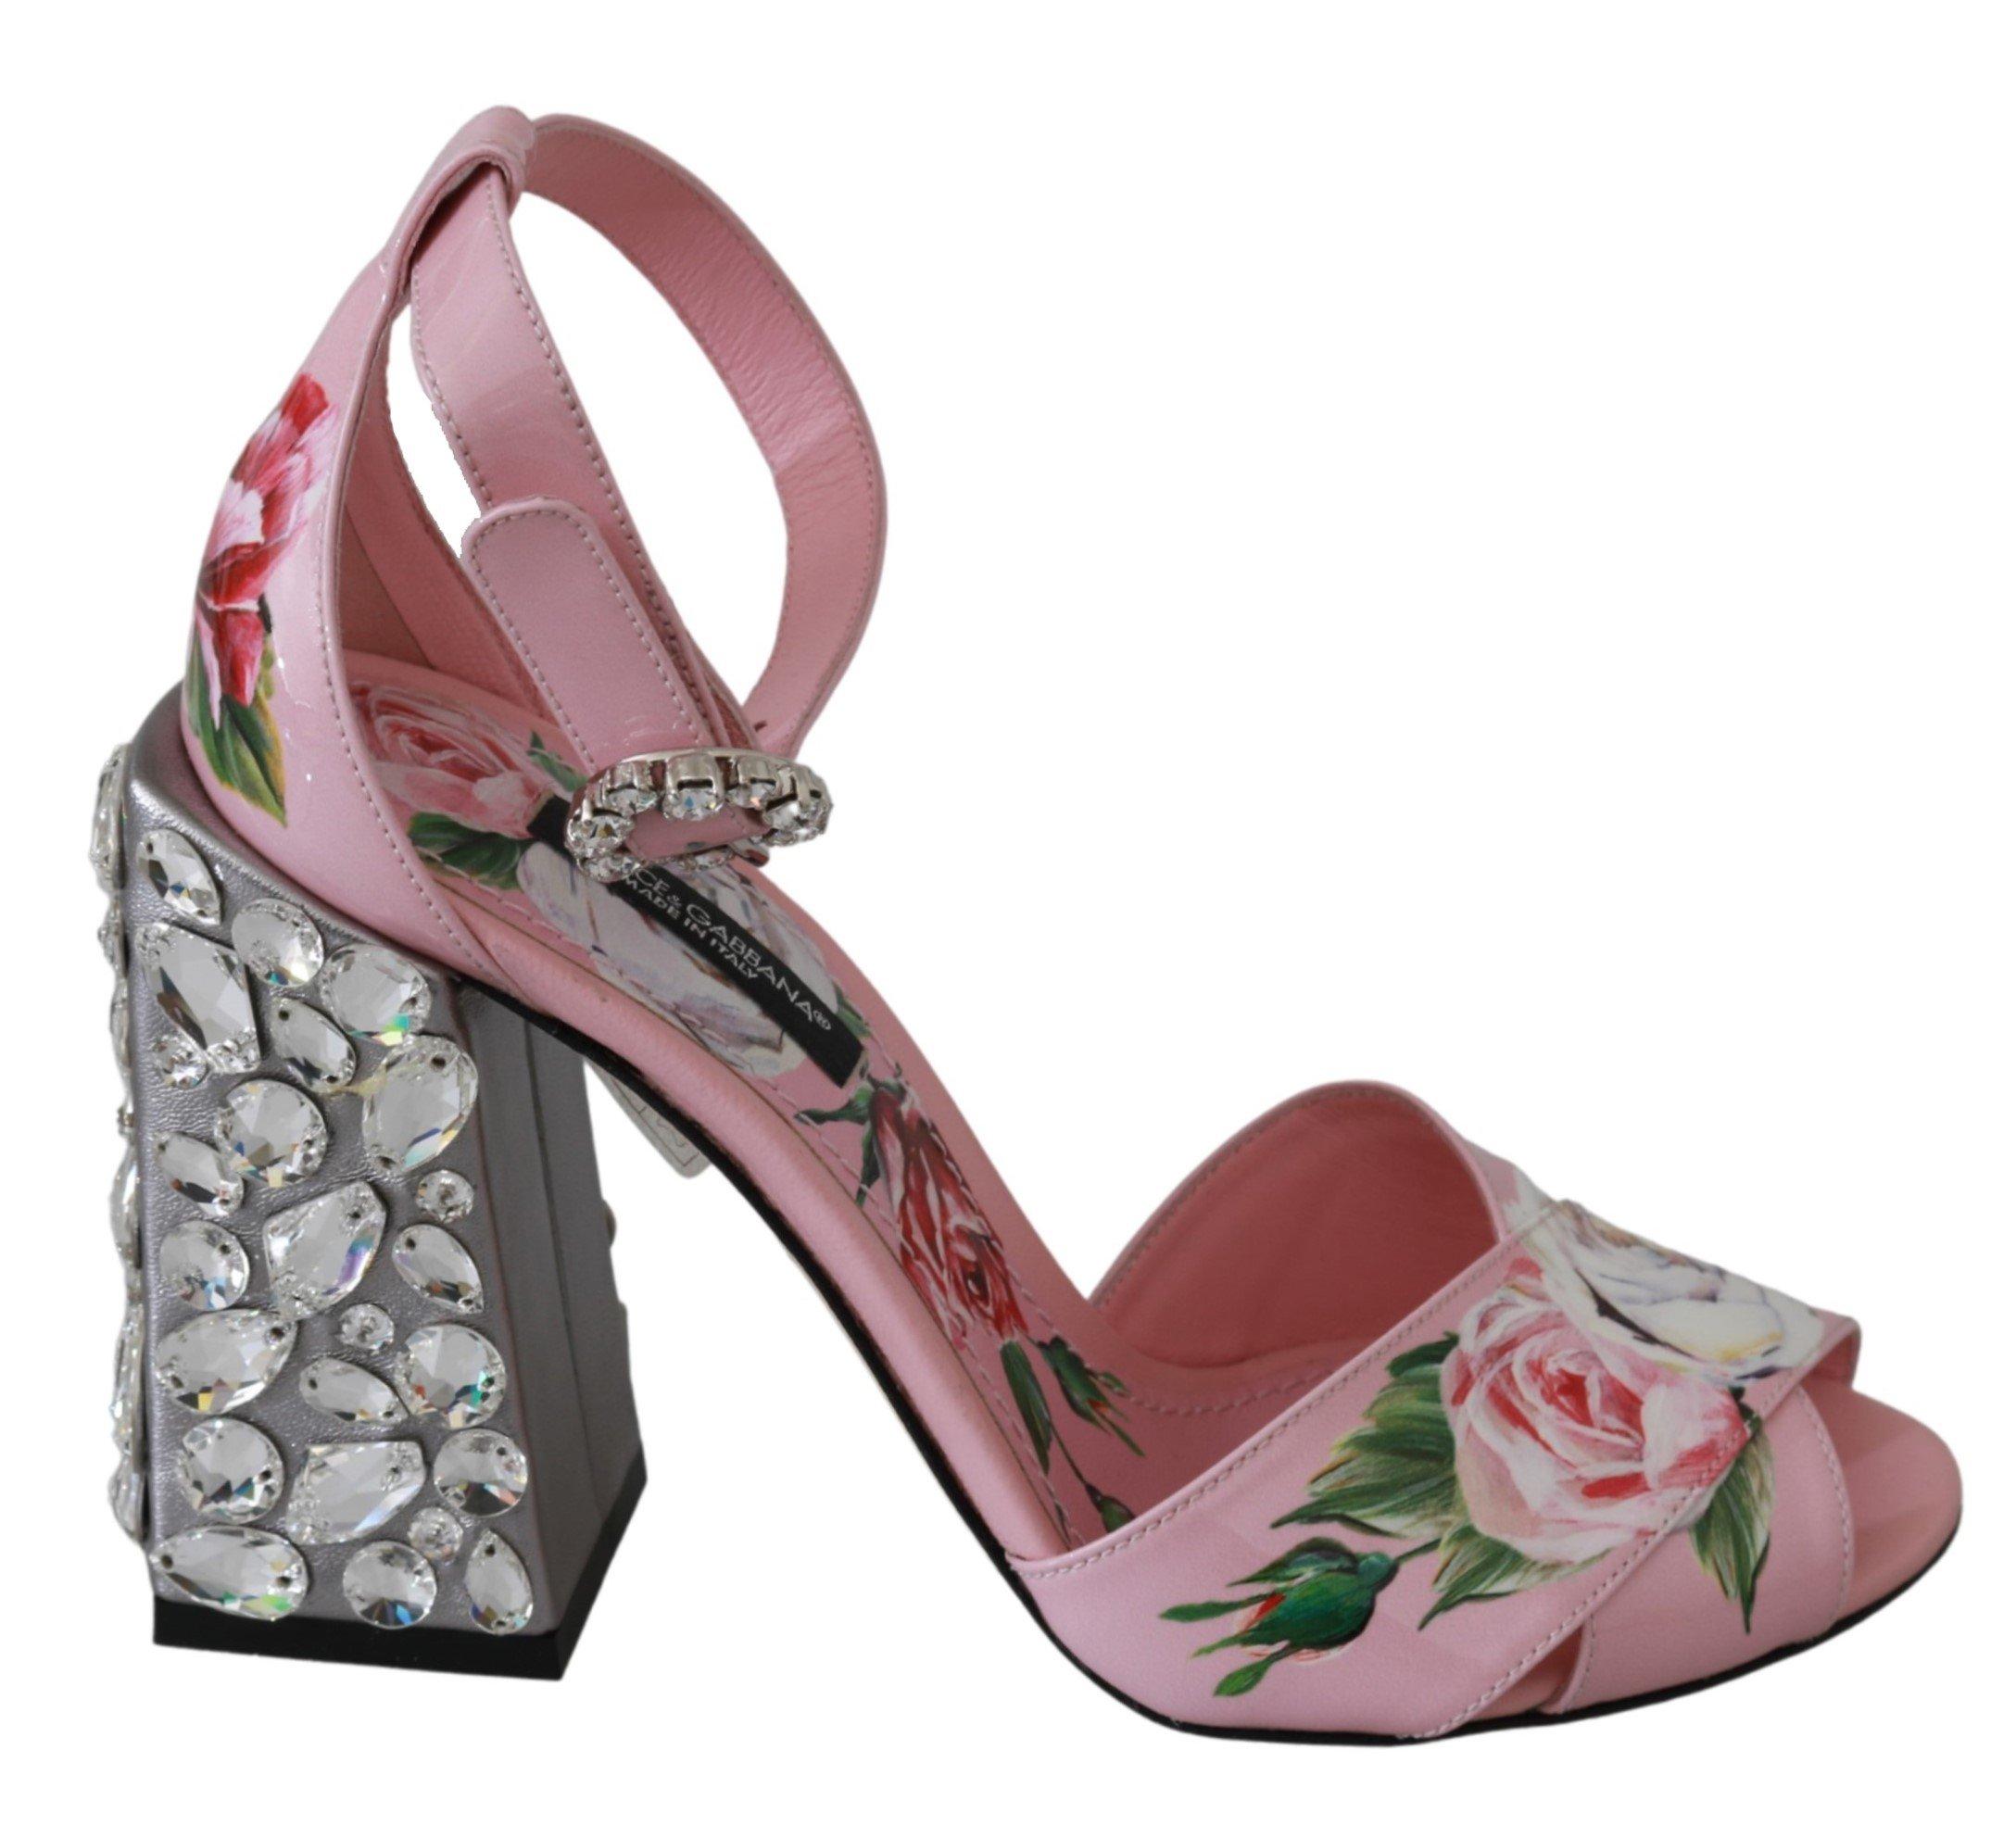 Dolce & Gabbana Women's Floral Leather Crystal Sandals Pink LA6515 - EU35.5/US5